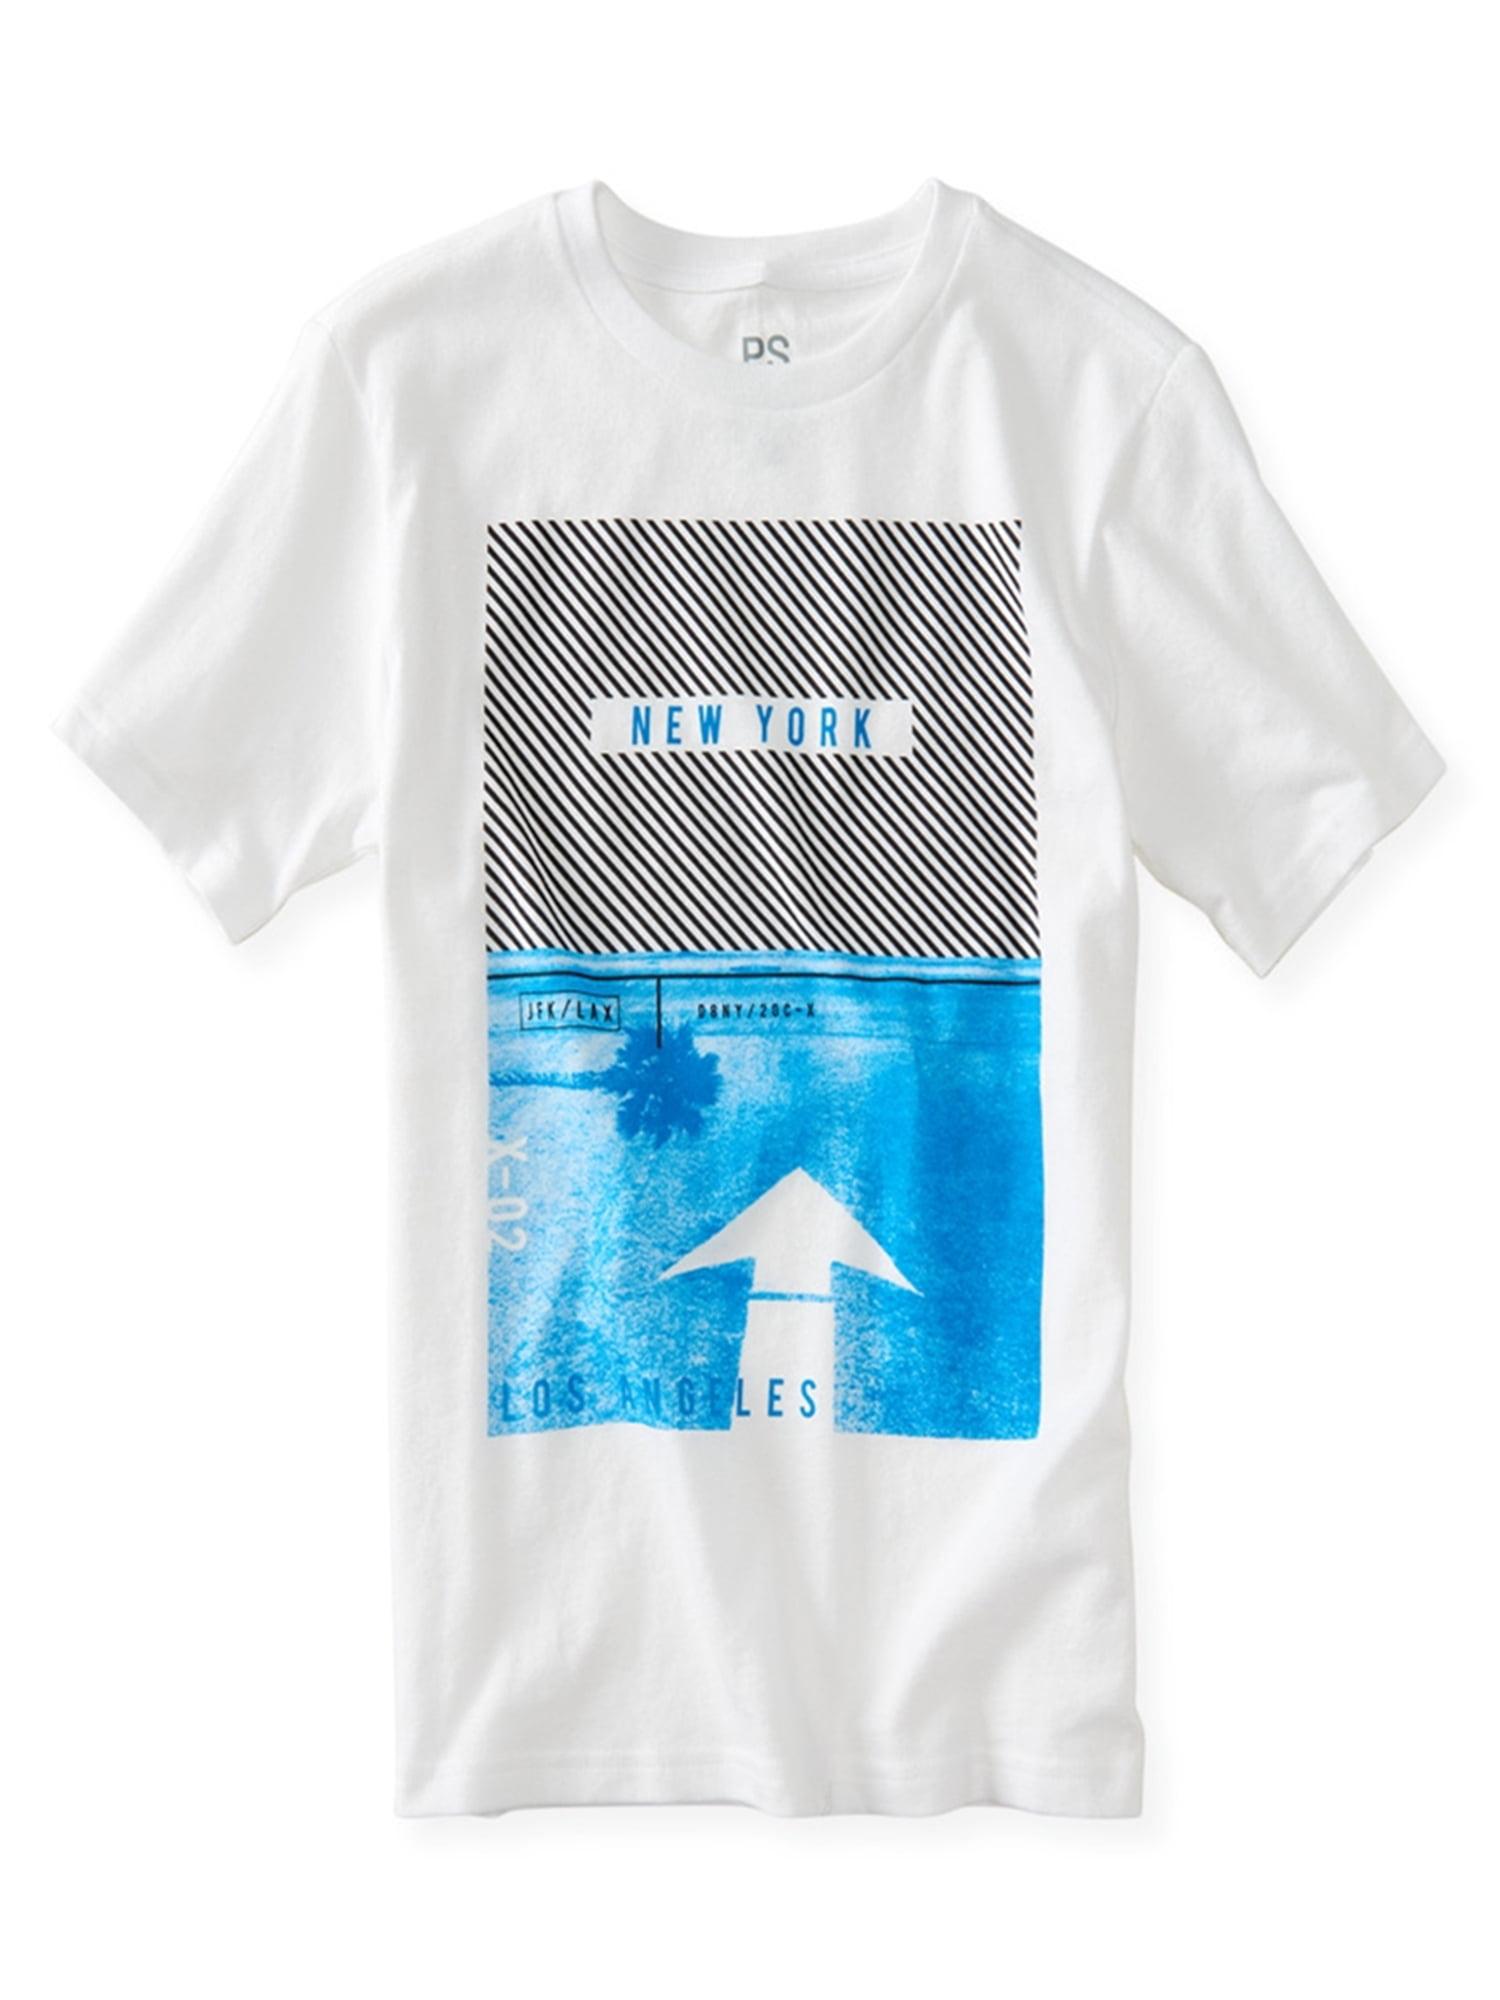 Aeropostale Boys New York Diagonal Graphic T-Shirt 102 Xs - Little Kids (4-7)